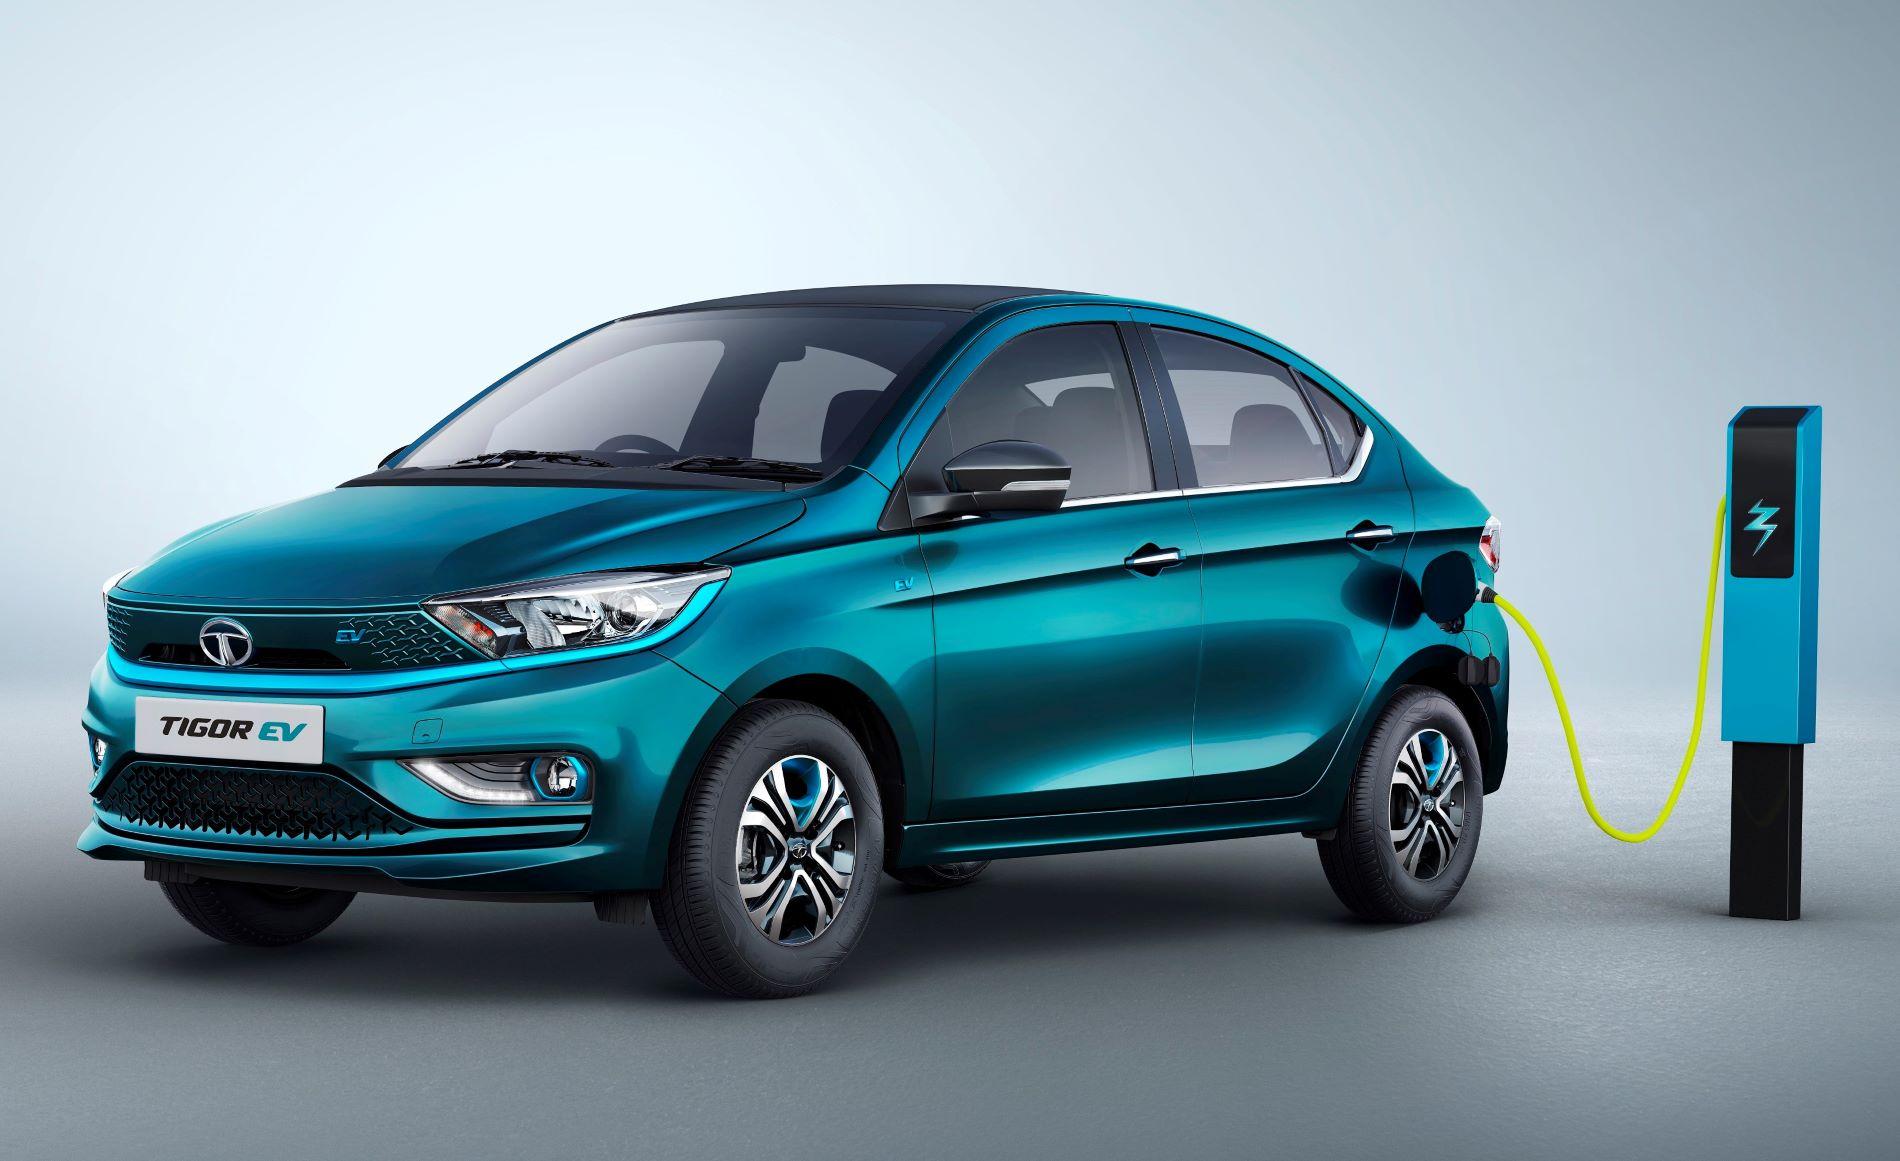 Tata Motors Tigor Ev Charging